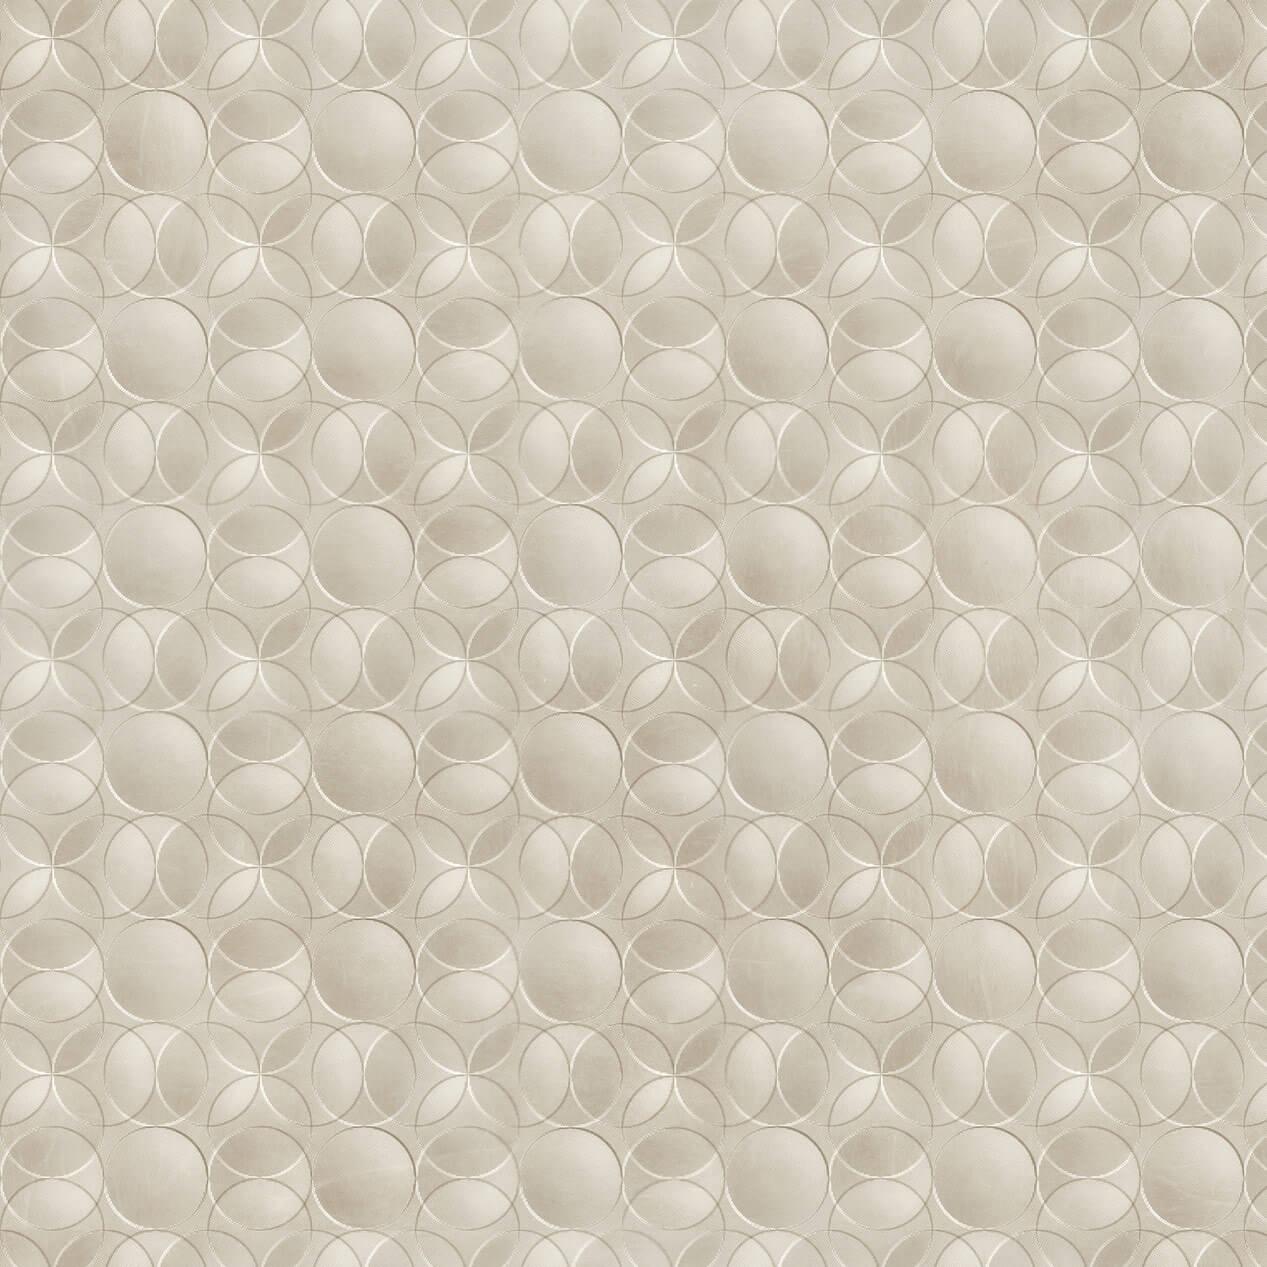 Papel de Parede Geométrico Círculos Tons de Cinza